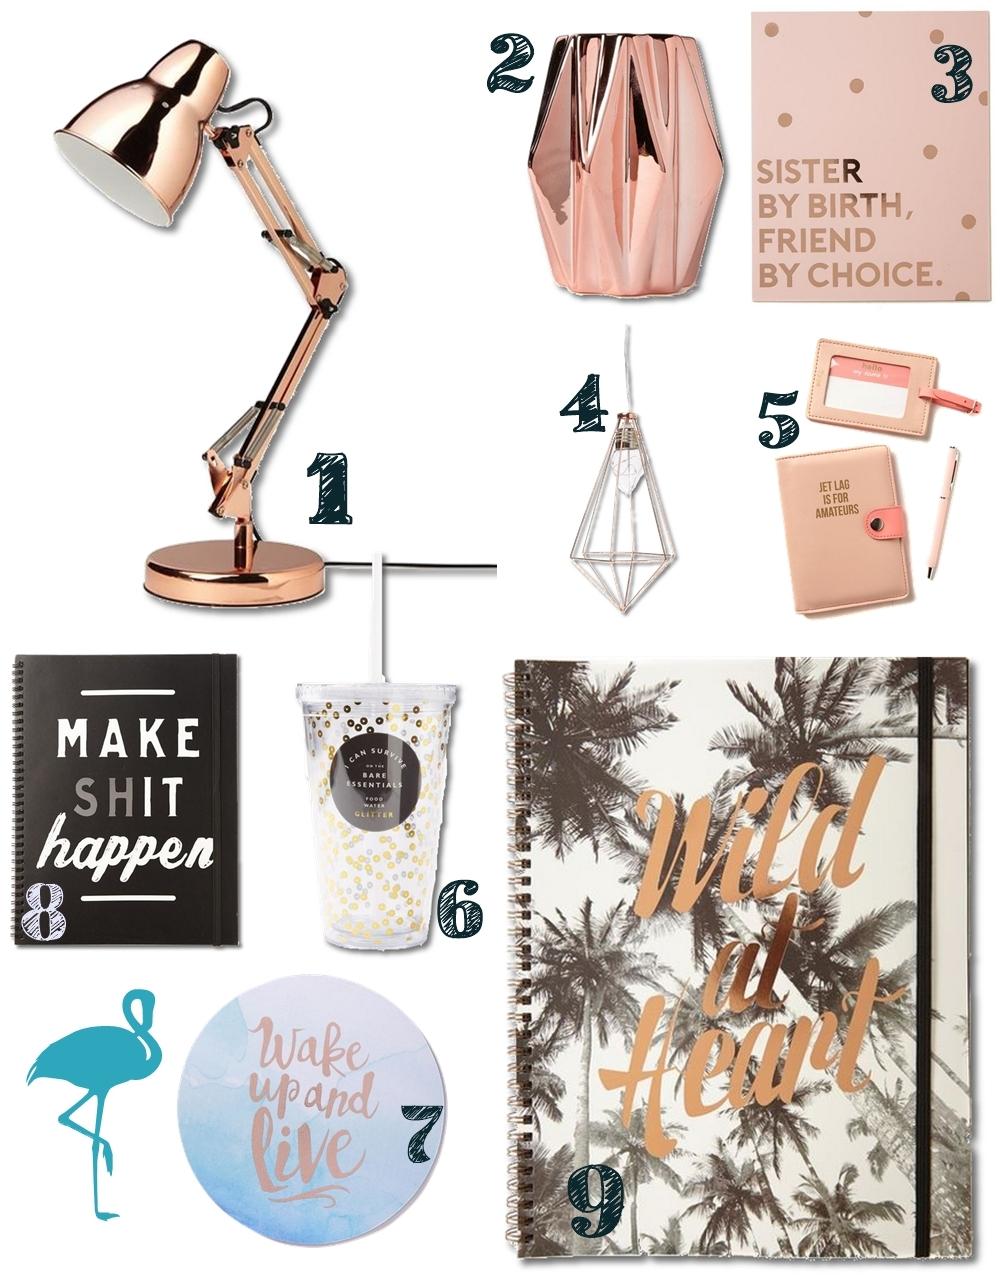 TYPO my Wishlist June - Interior and Deco Wishlist Collage 2